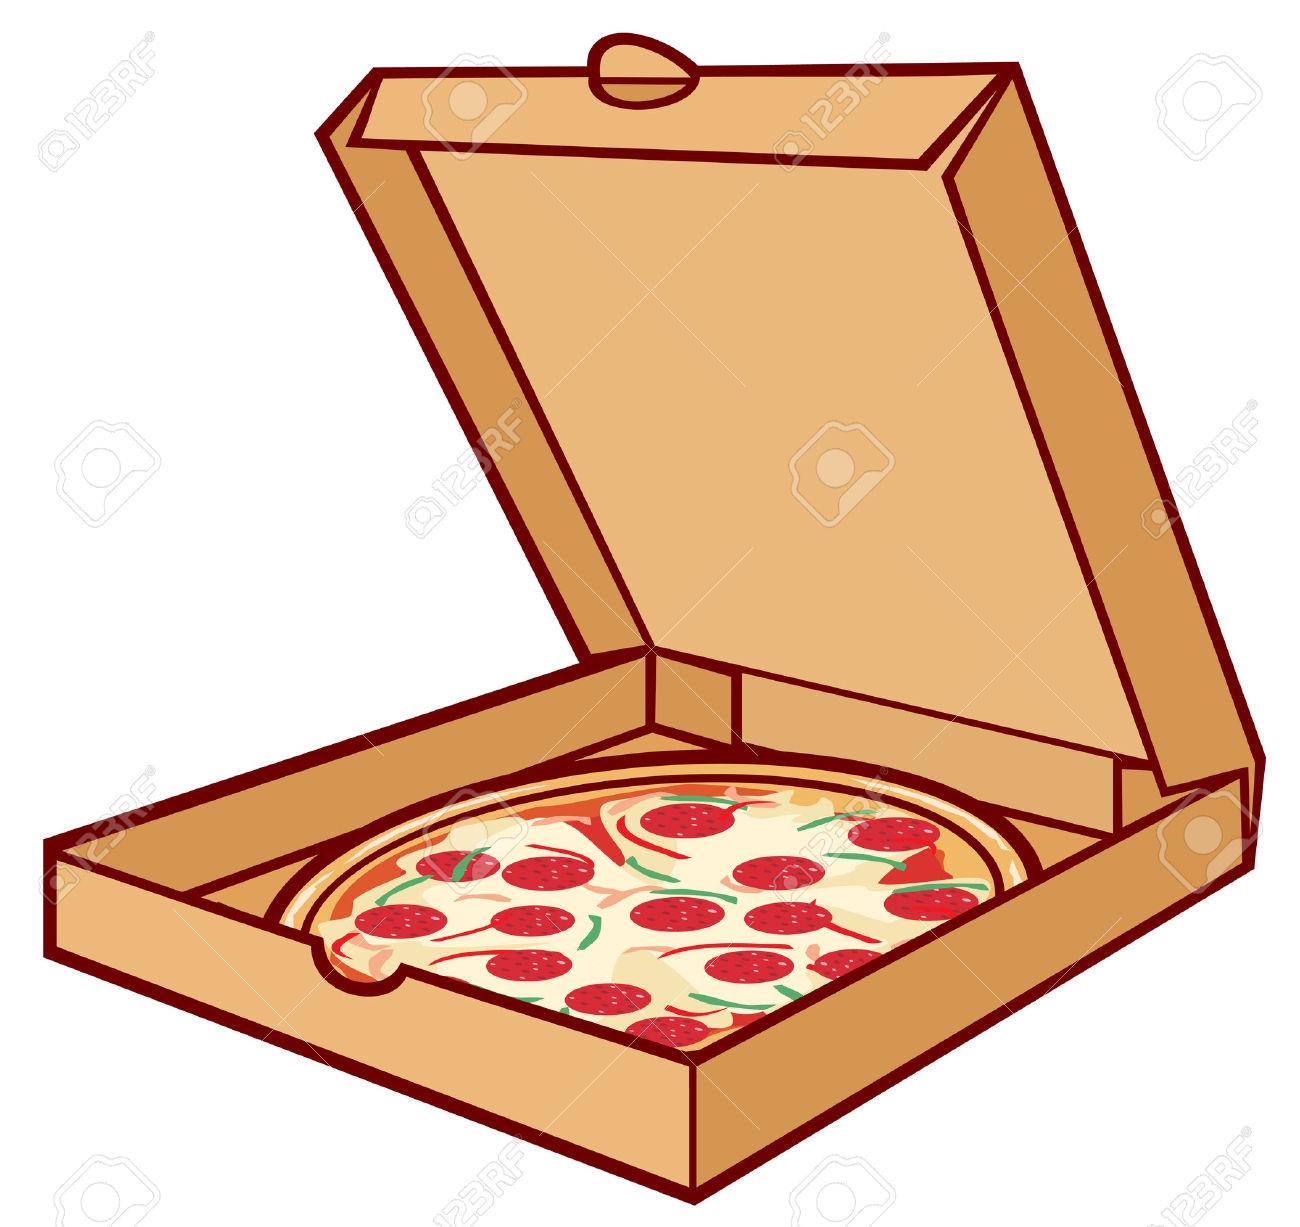 open pizza box clipart clipground. Black Bedroom Furniture Sets. Home Design Ideas